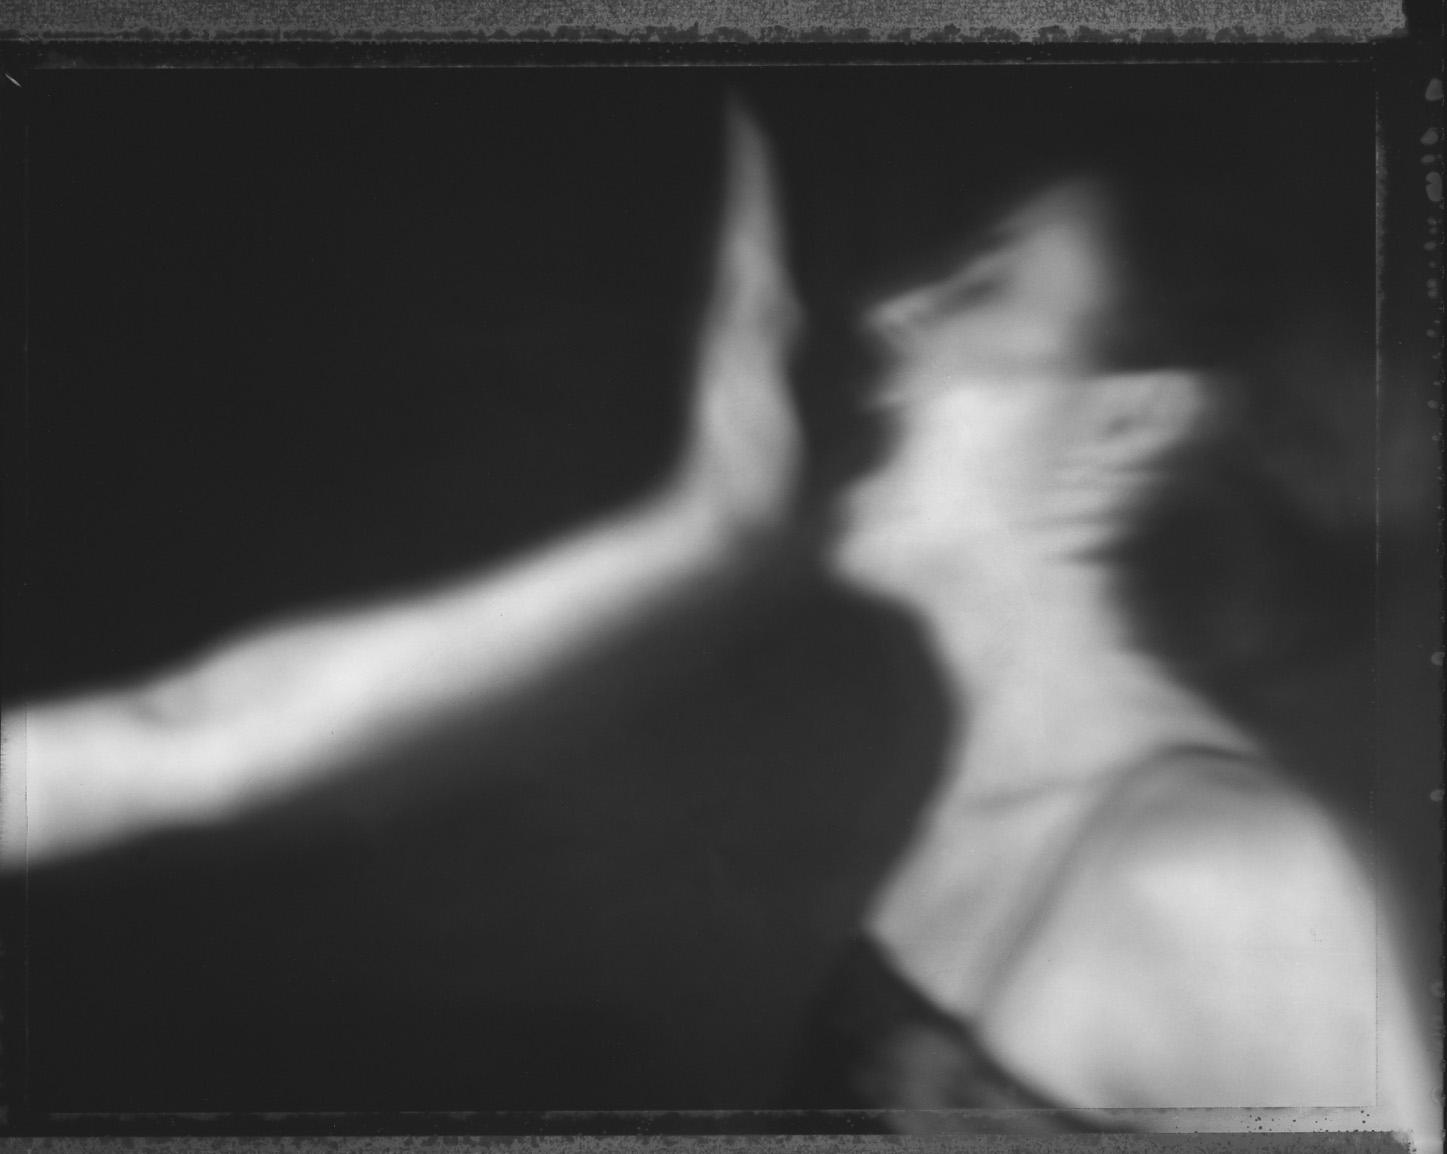 Self Portrait #81A, 2002